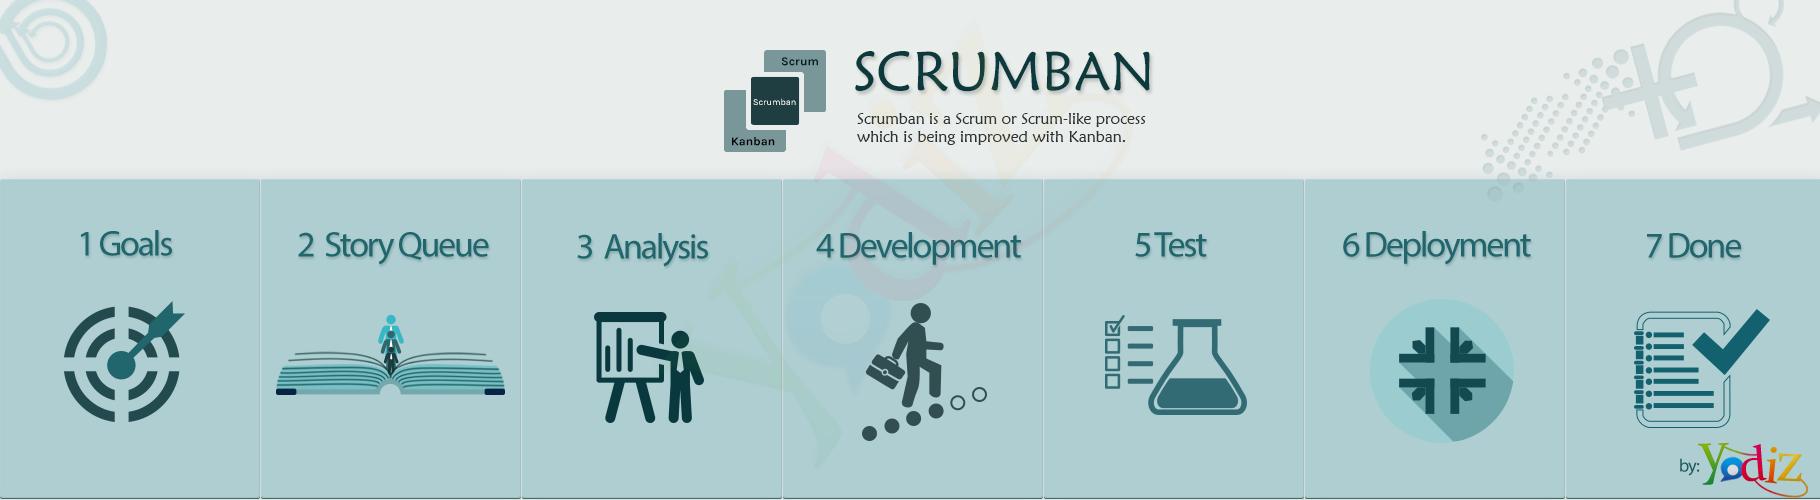 Scrumban - Yodiz Project Management Tool